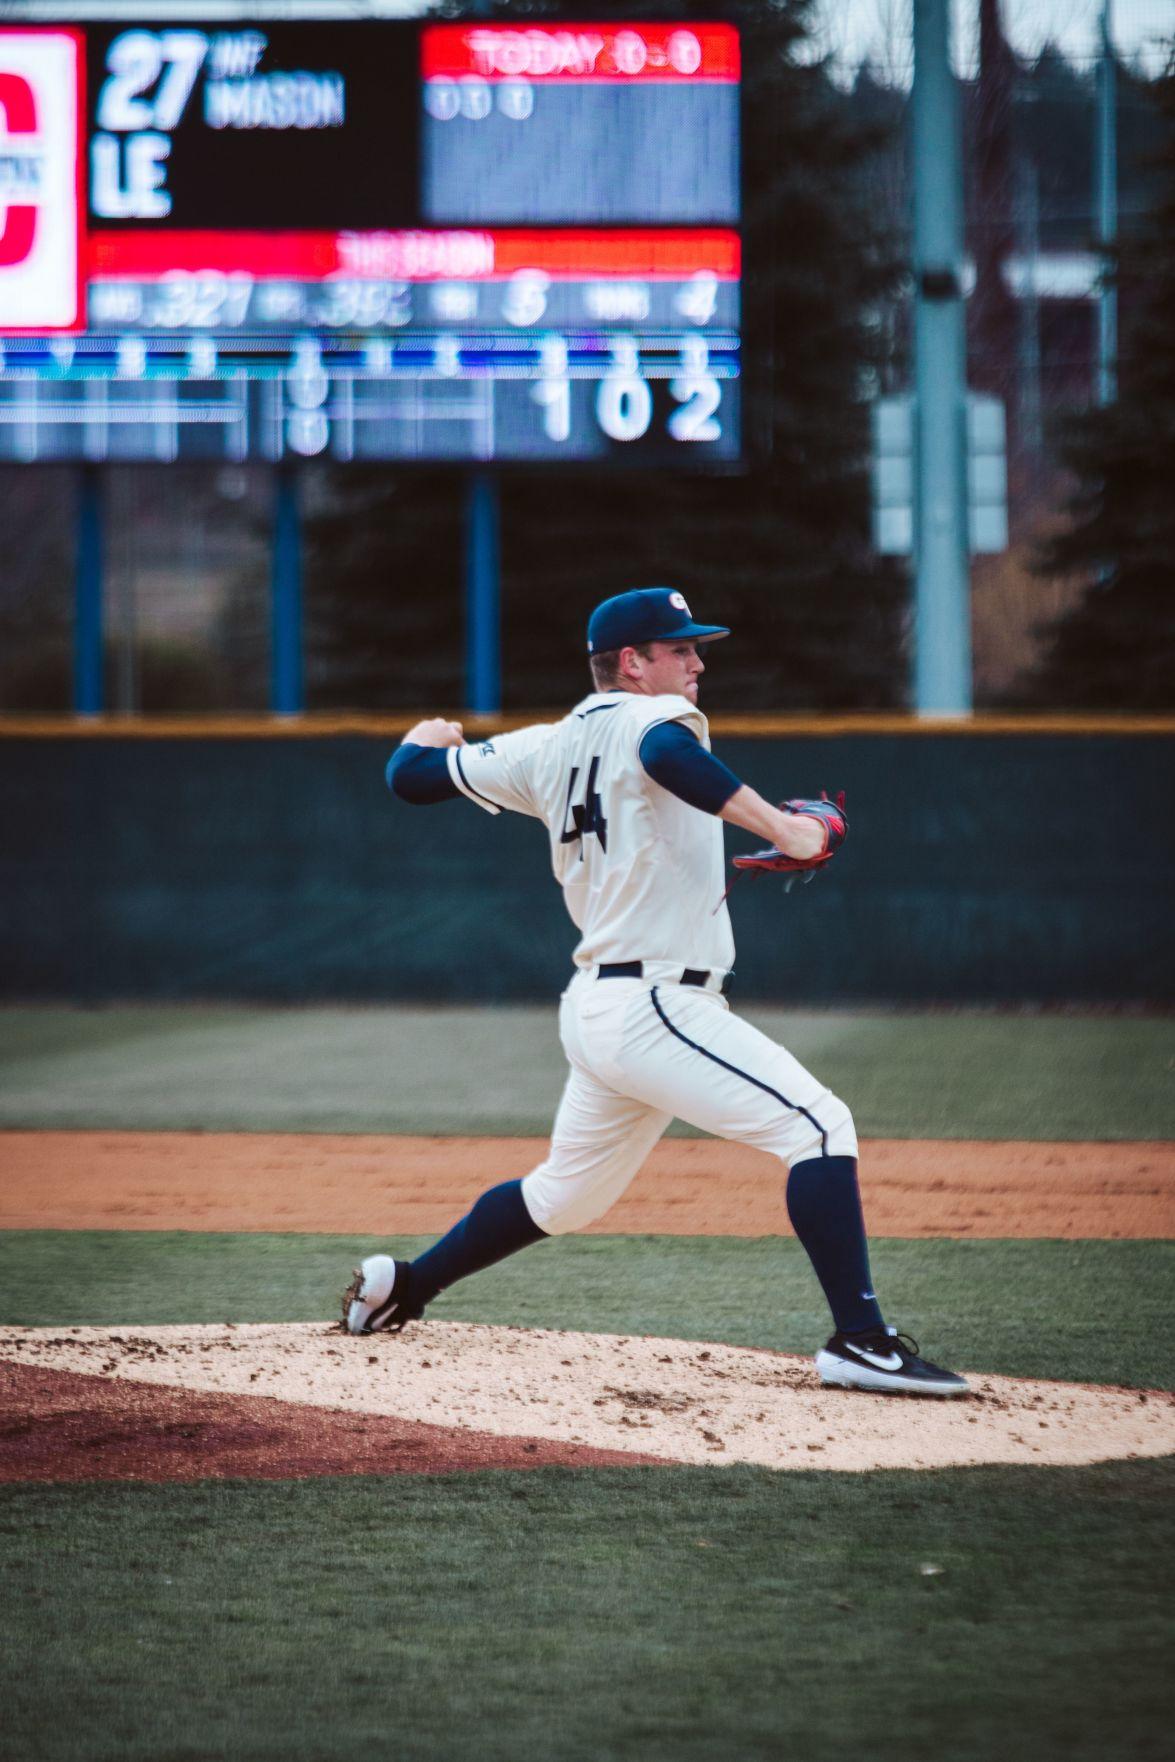 Baseball: Gonzaga's bats slump as CSUN wins 4-3 in 10 innings